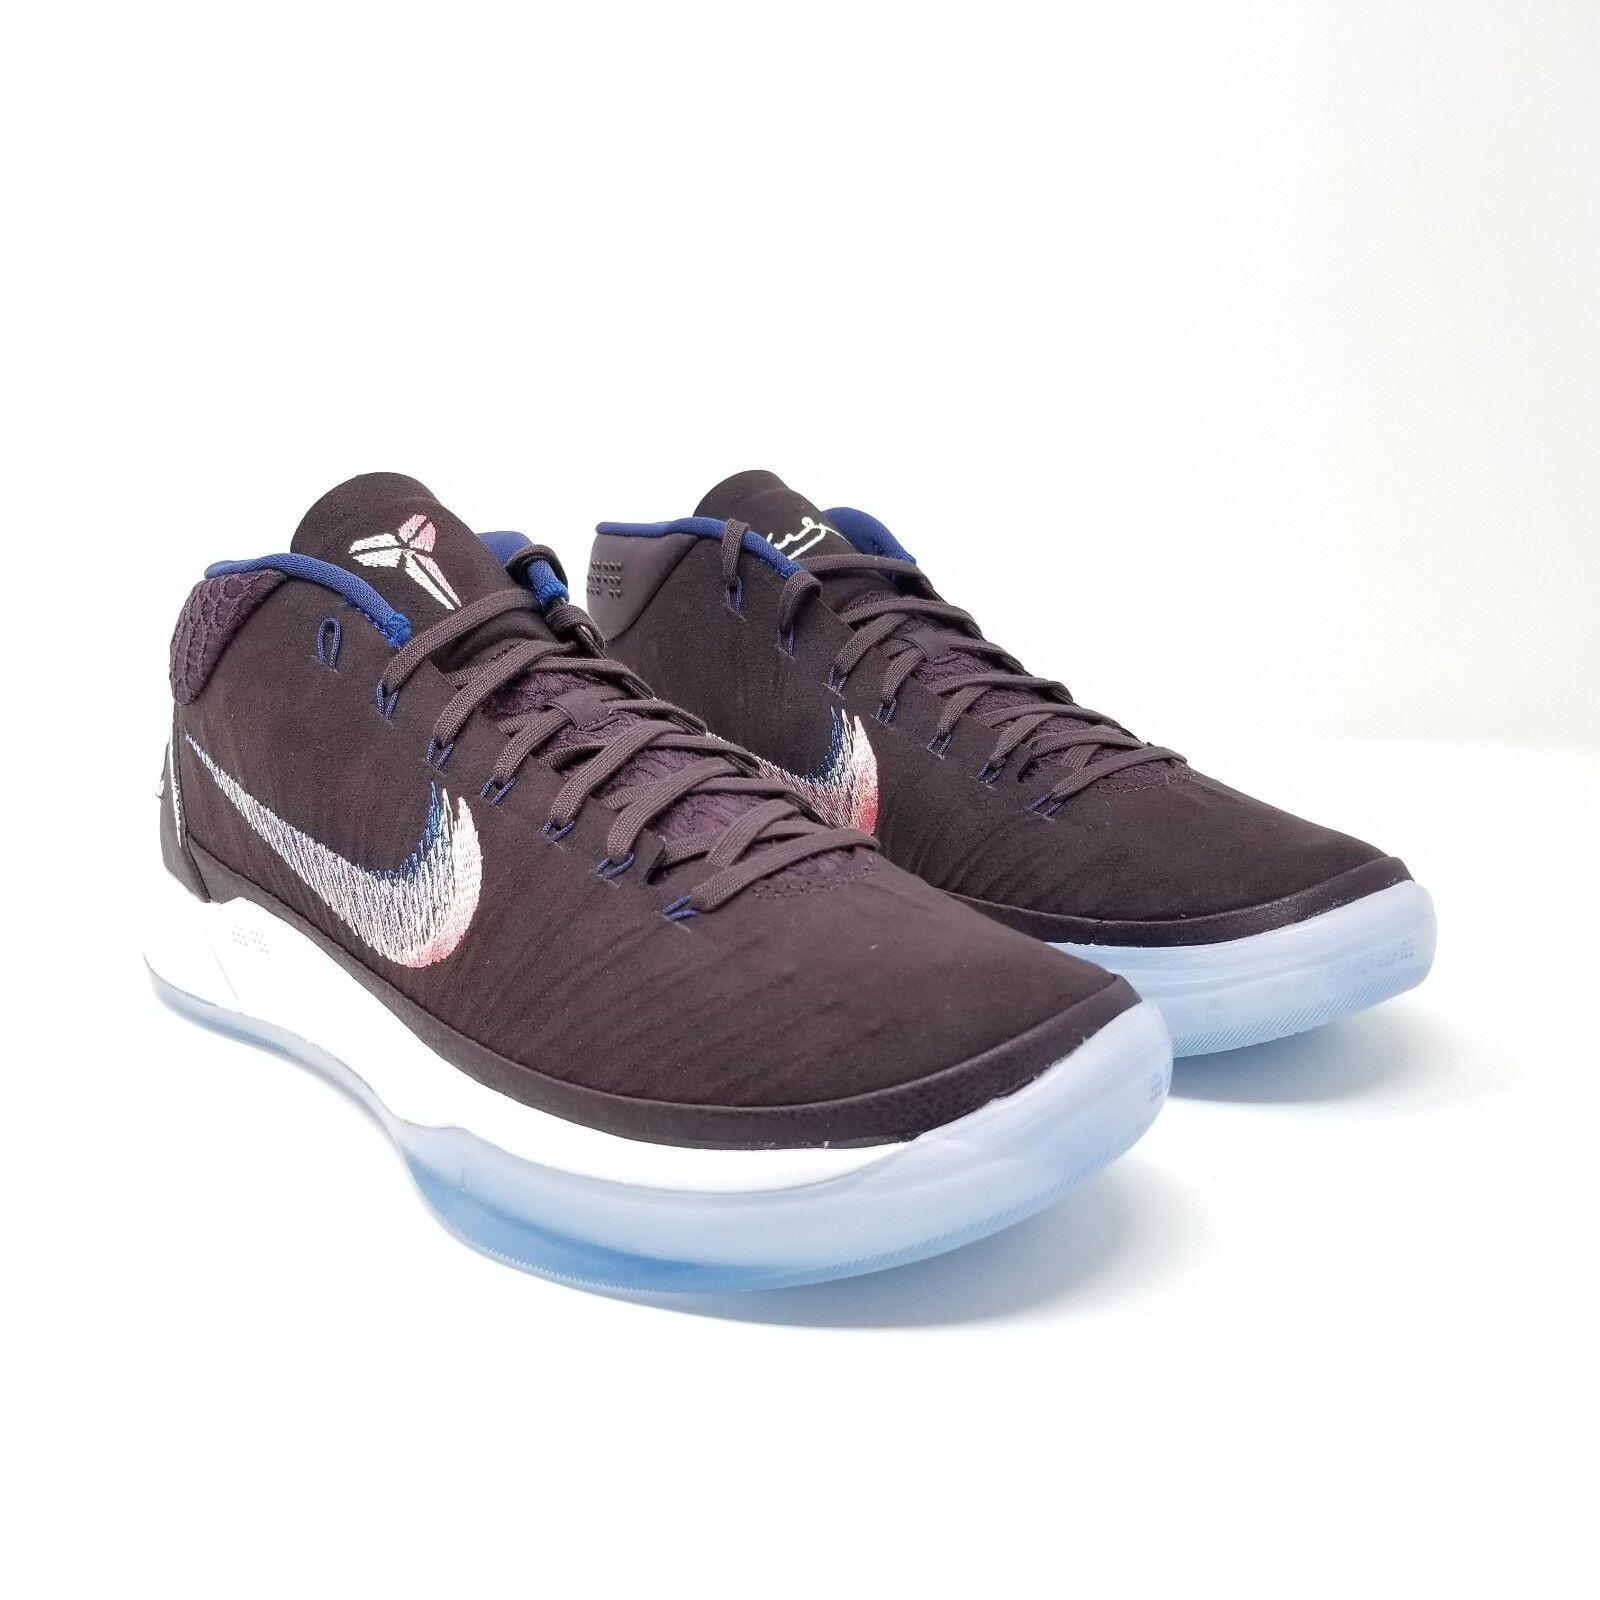 Nike Mens Air Kobe Bryant A.D. Port Wine Mamba 922482-602 AD Purple White blueee